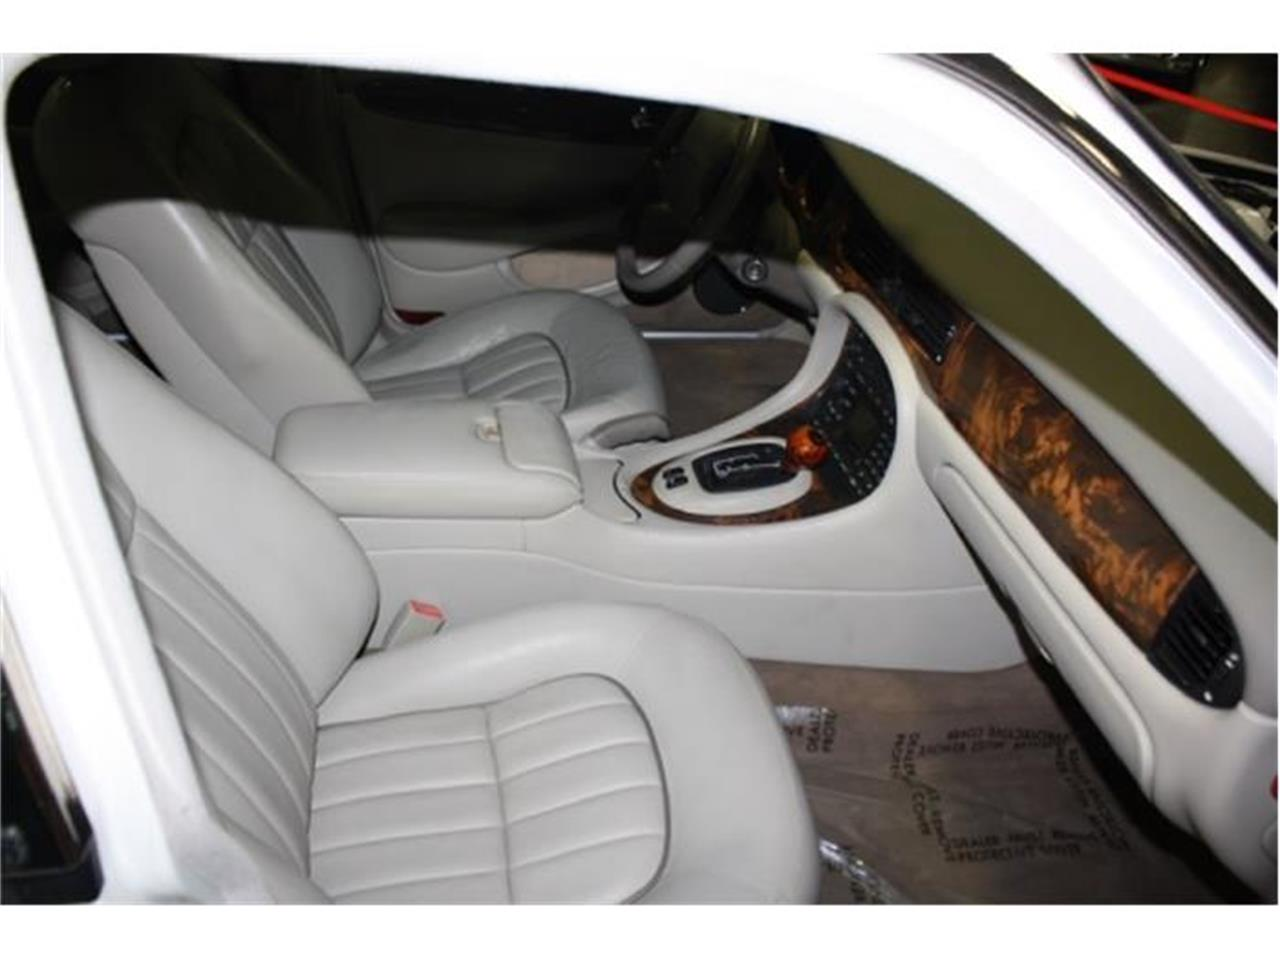 Large Picture of '01 Jaguar XJ8 located in Branson Missouri - $7,000.00 - DSCT